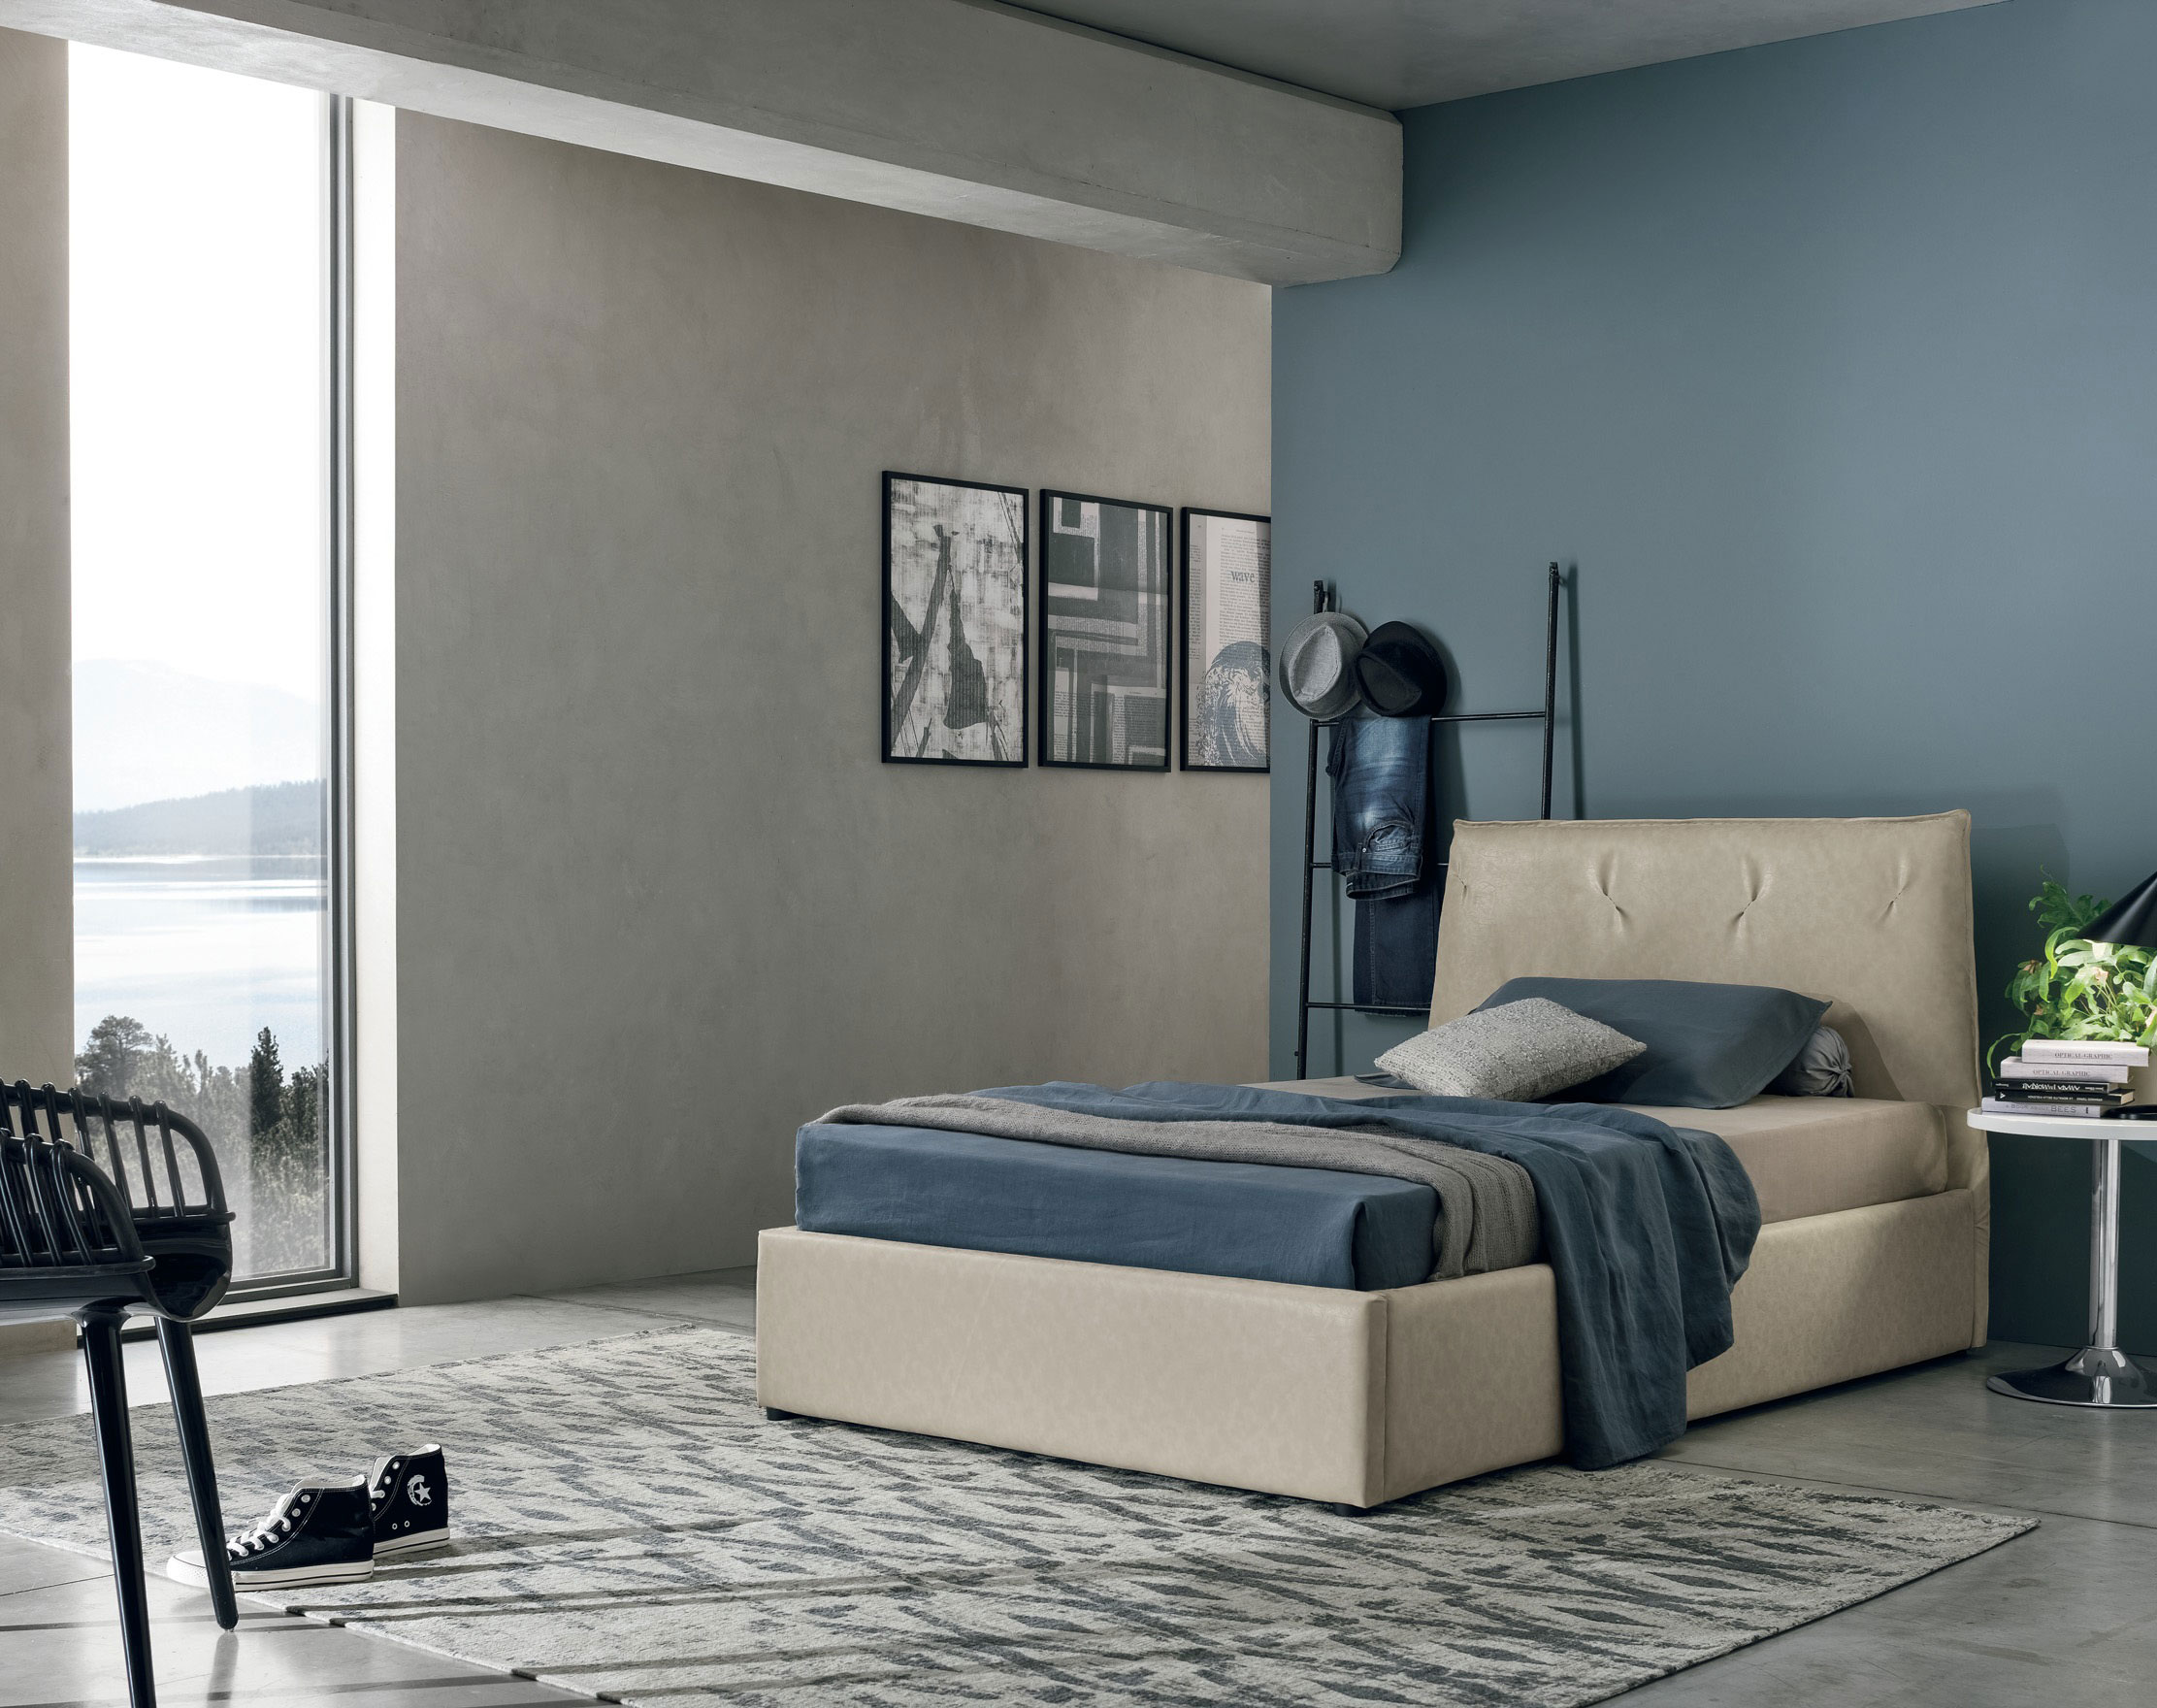 beige leather bed with no legs, modern kids bed ,meseou megethous krevati paidiko dermatino, paidiko krevati xoris podia,